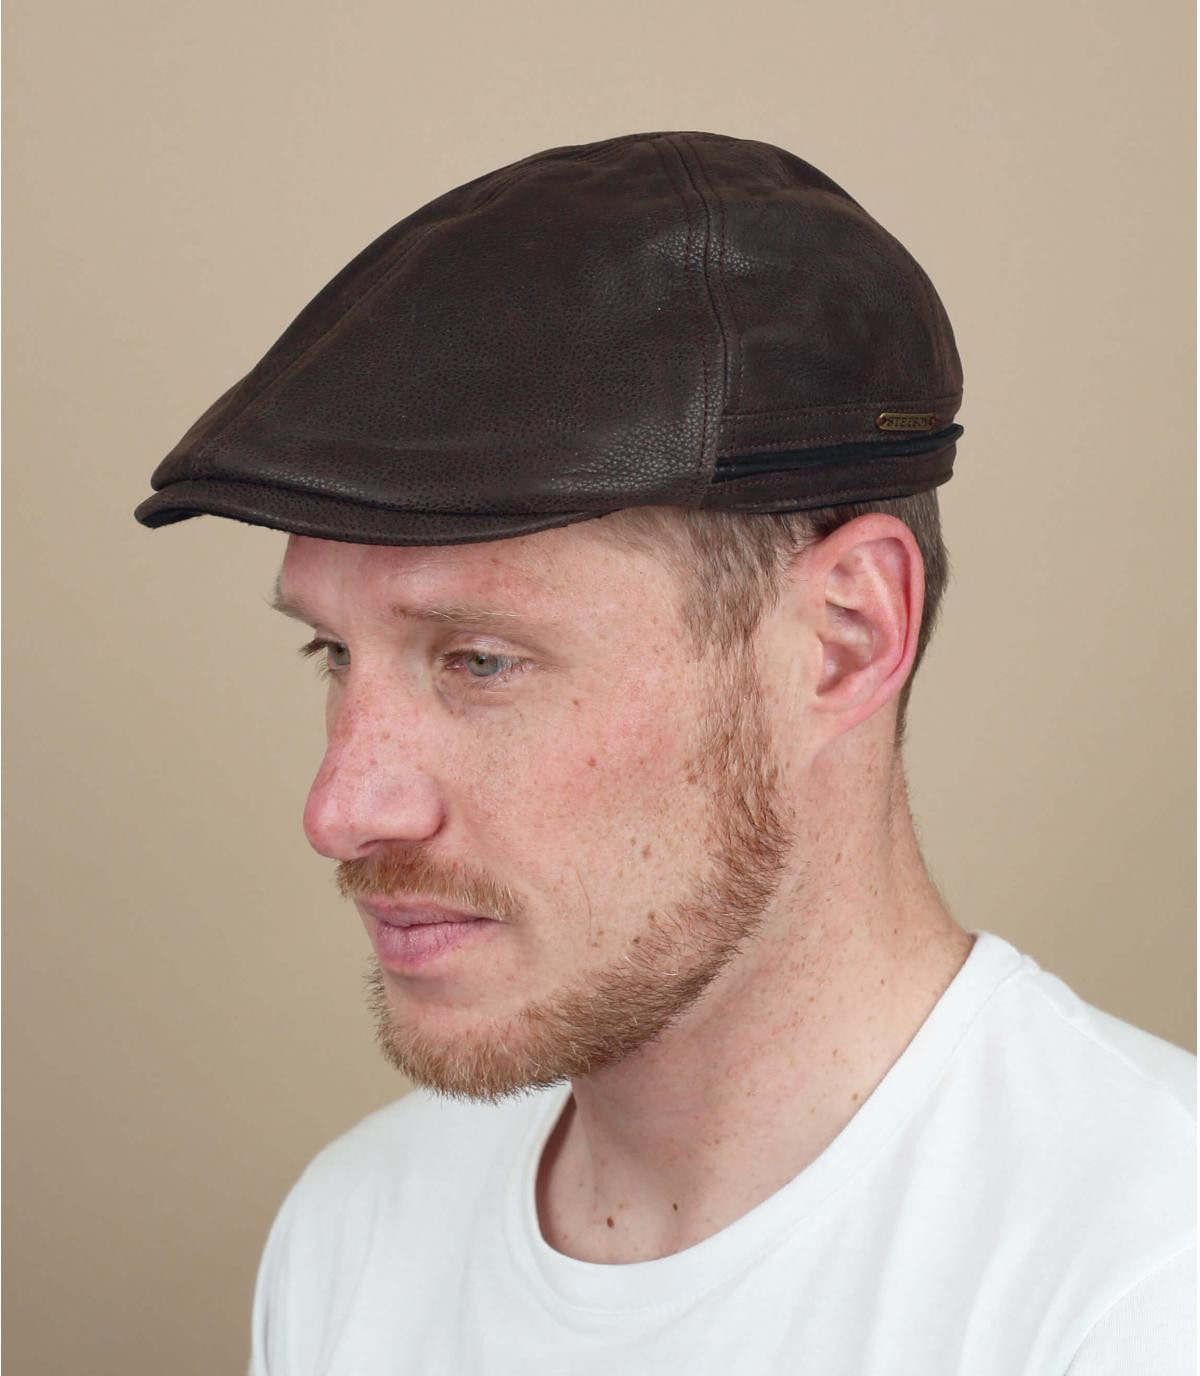 Stetson brown flat cap